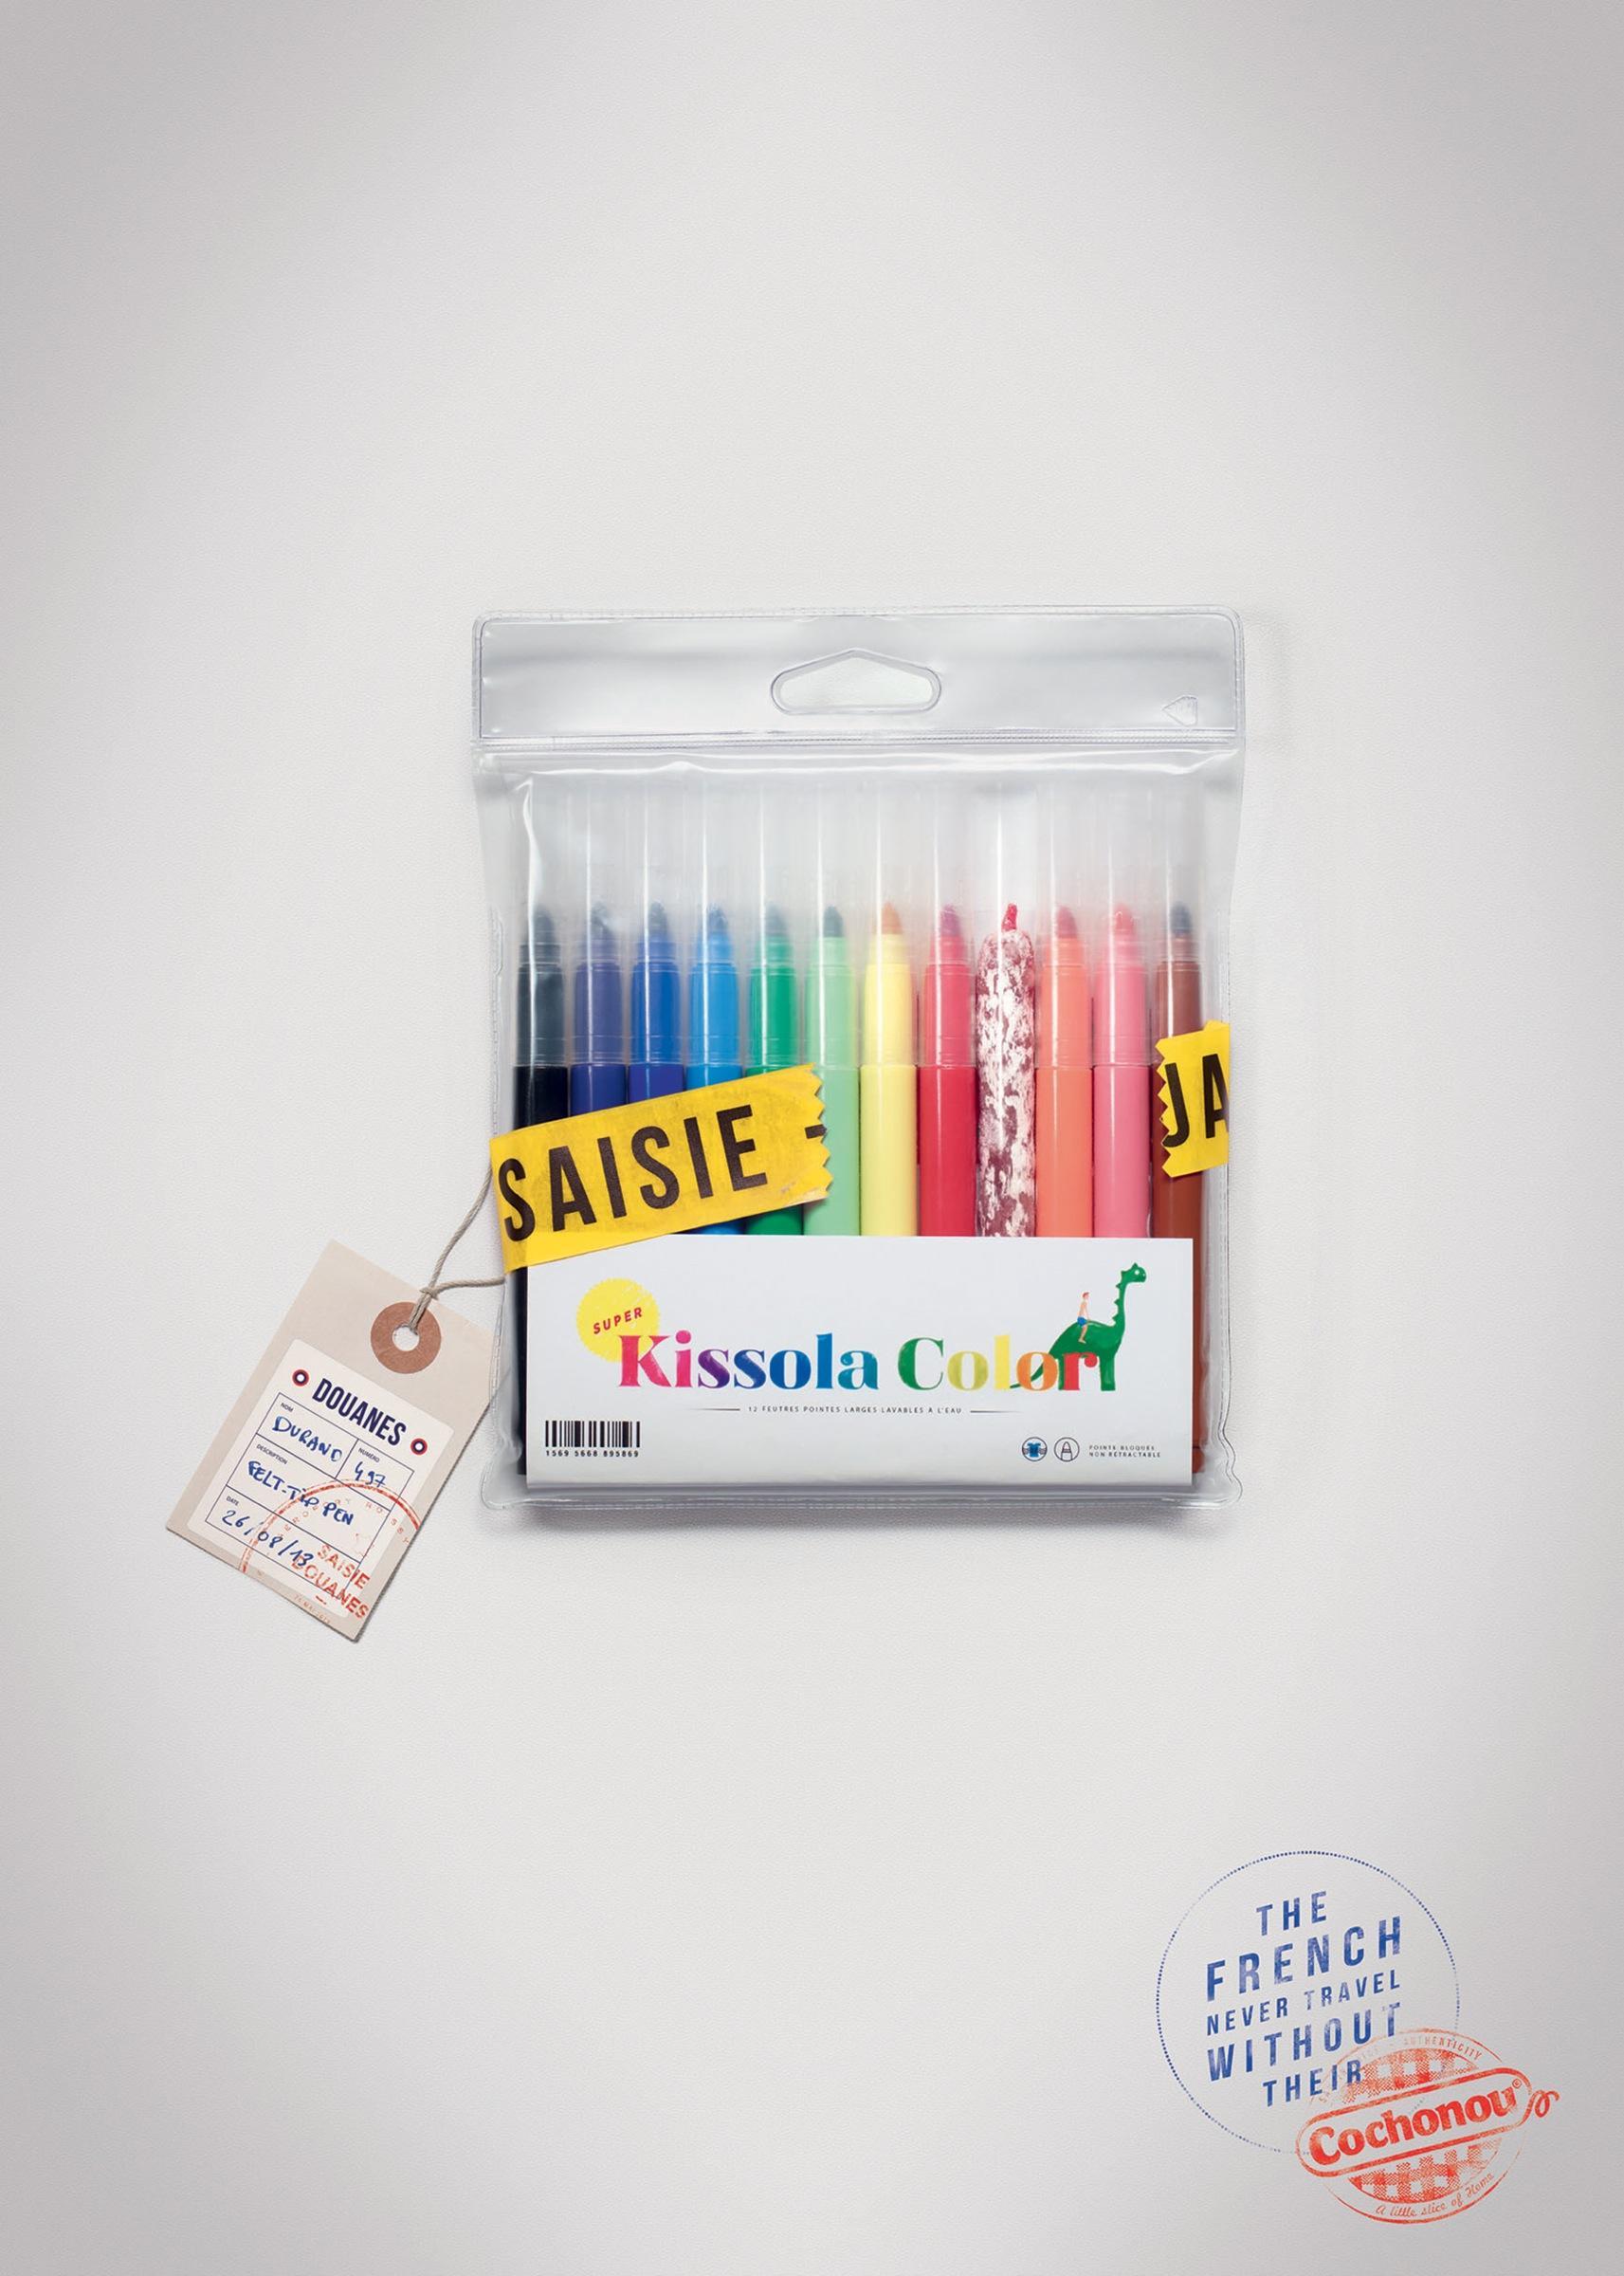 Cochonou Print Ad -  Customs, 5